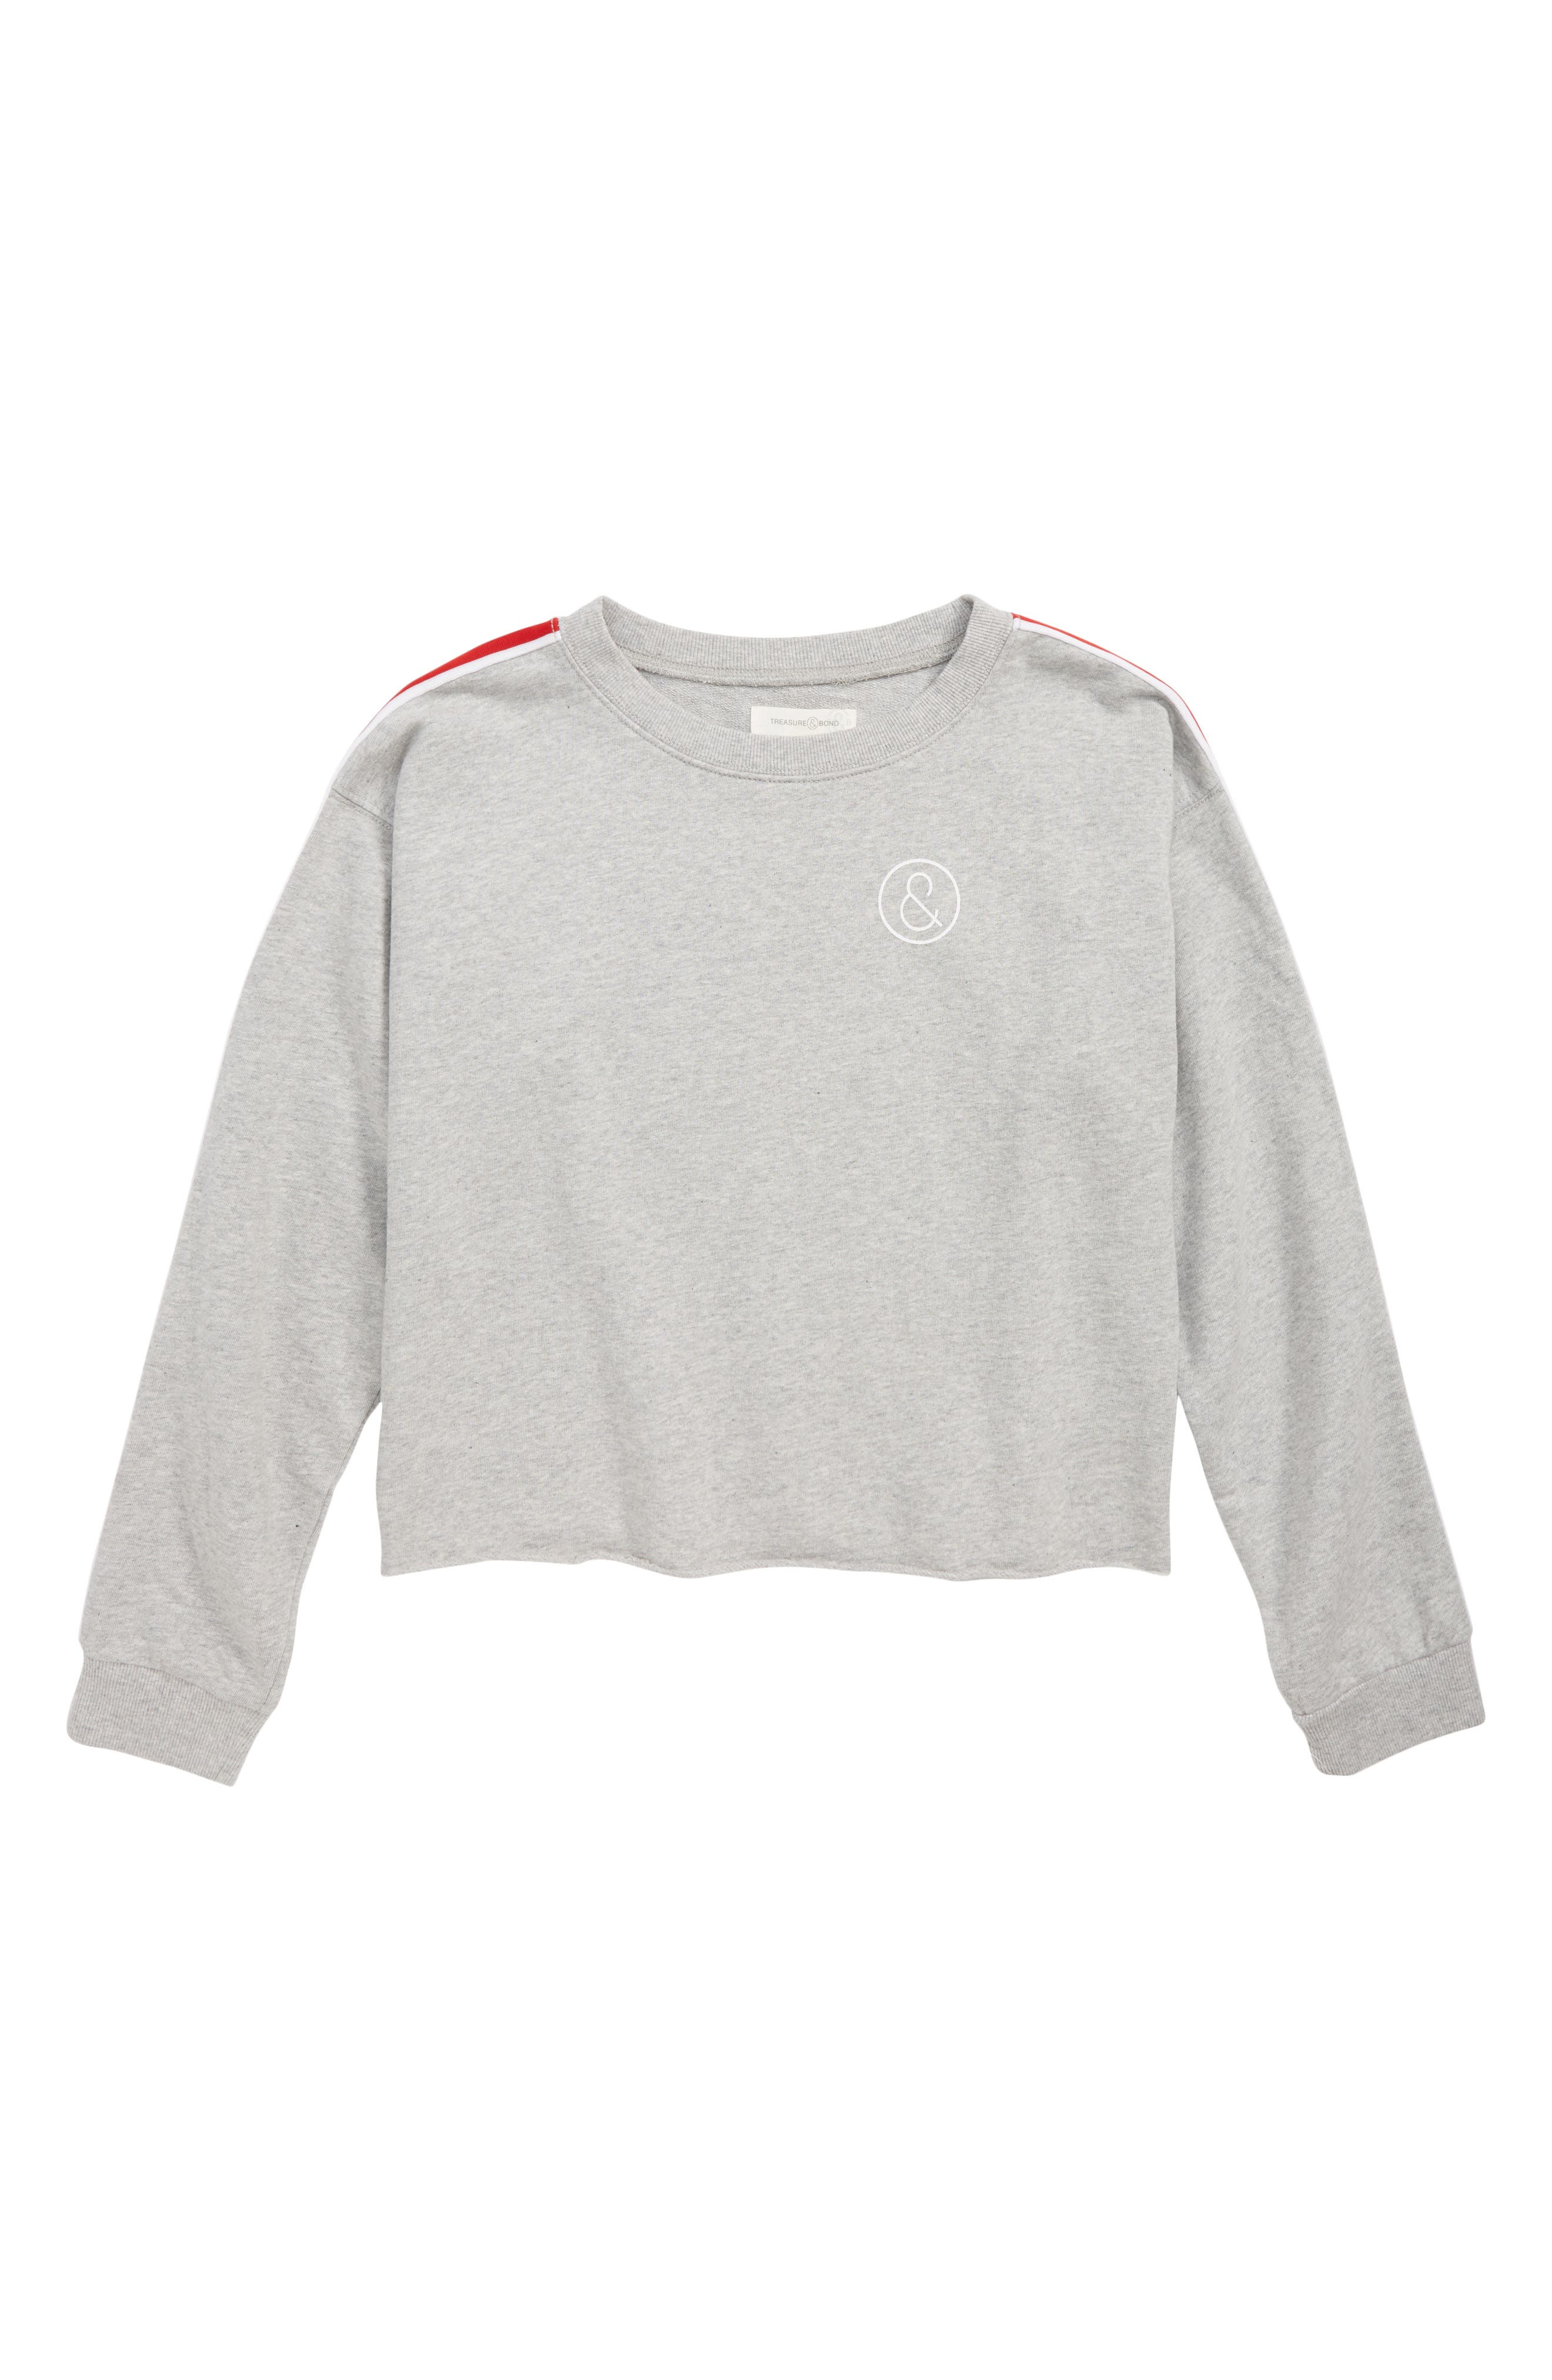 Varsity Fleece Sweatshirt,                         Main,                         color, GREY ASH HEATHER